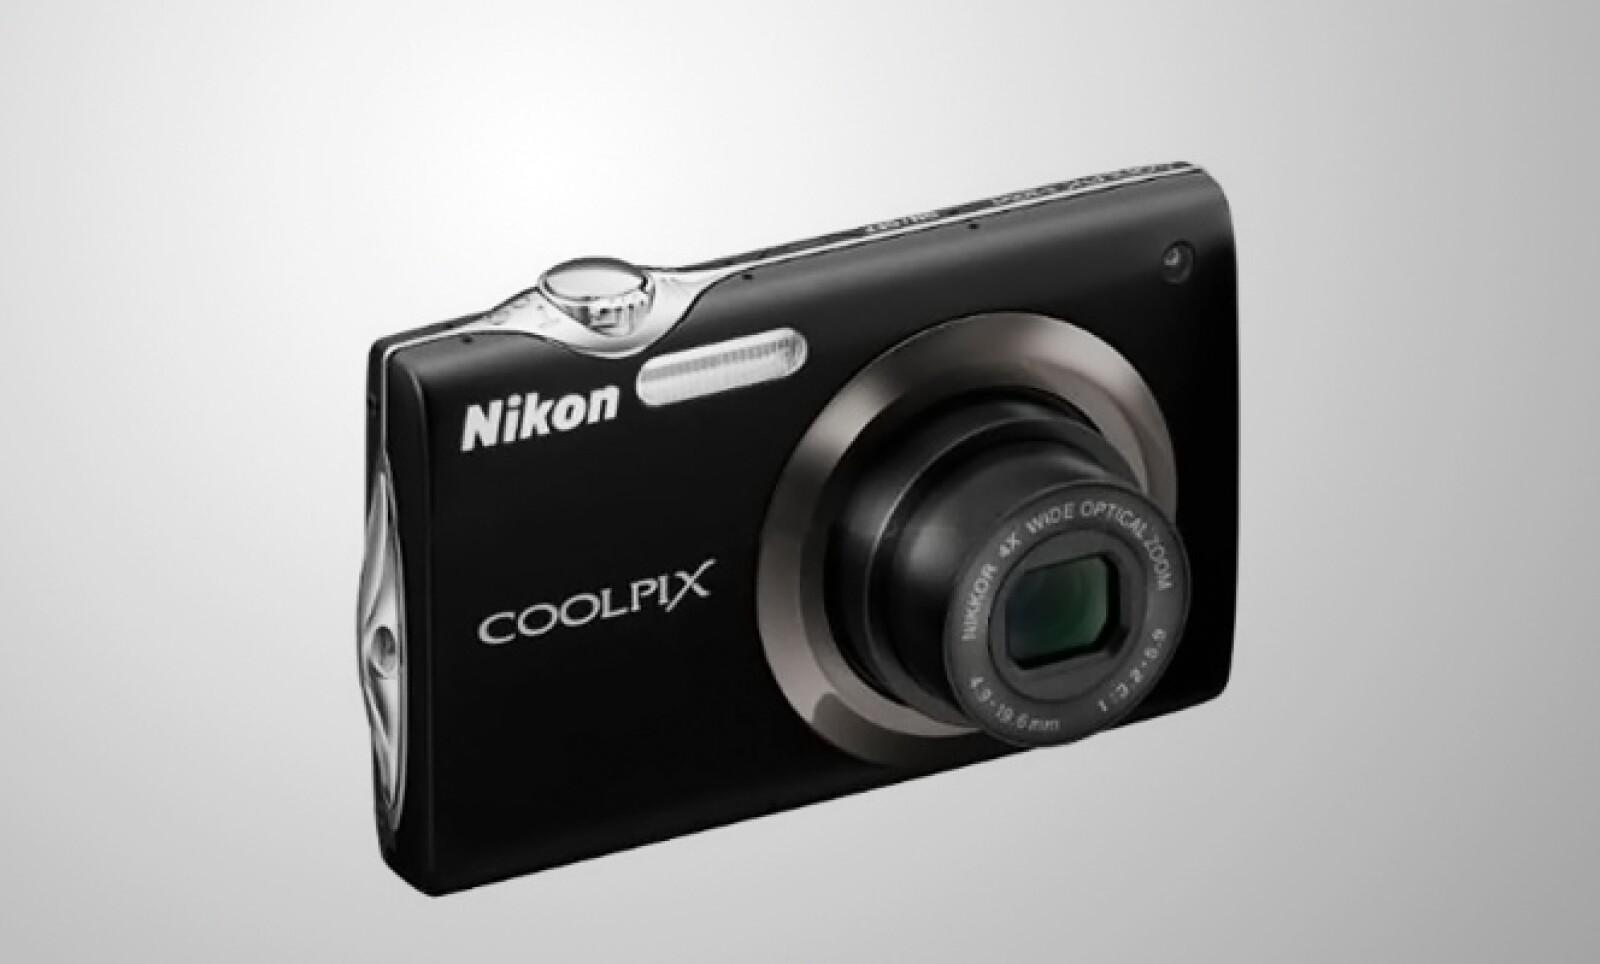 Si hay algo que les gusta, es la fotografía: te recomendamos esta Nikon Coolpix S4100 de 14 megapixeles.